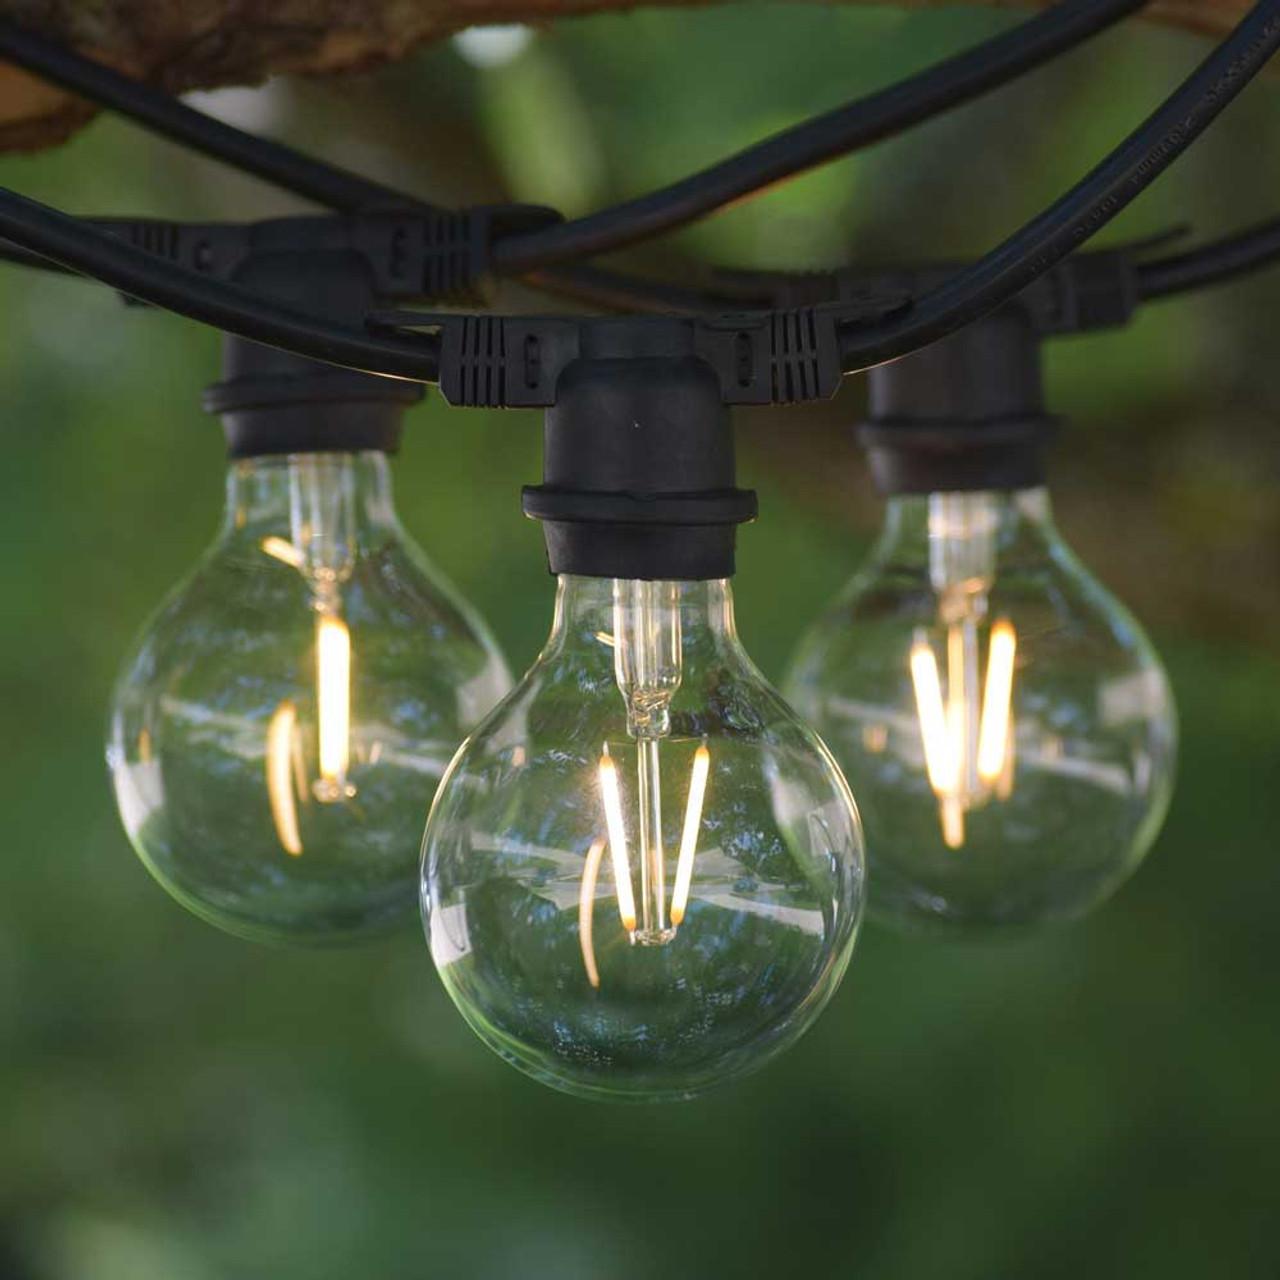 Vintage Outdoor String Lights 100 Black Led G80 Edison Bulbs